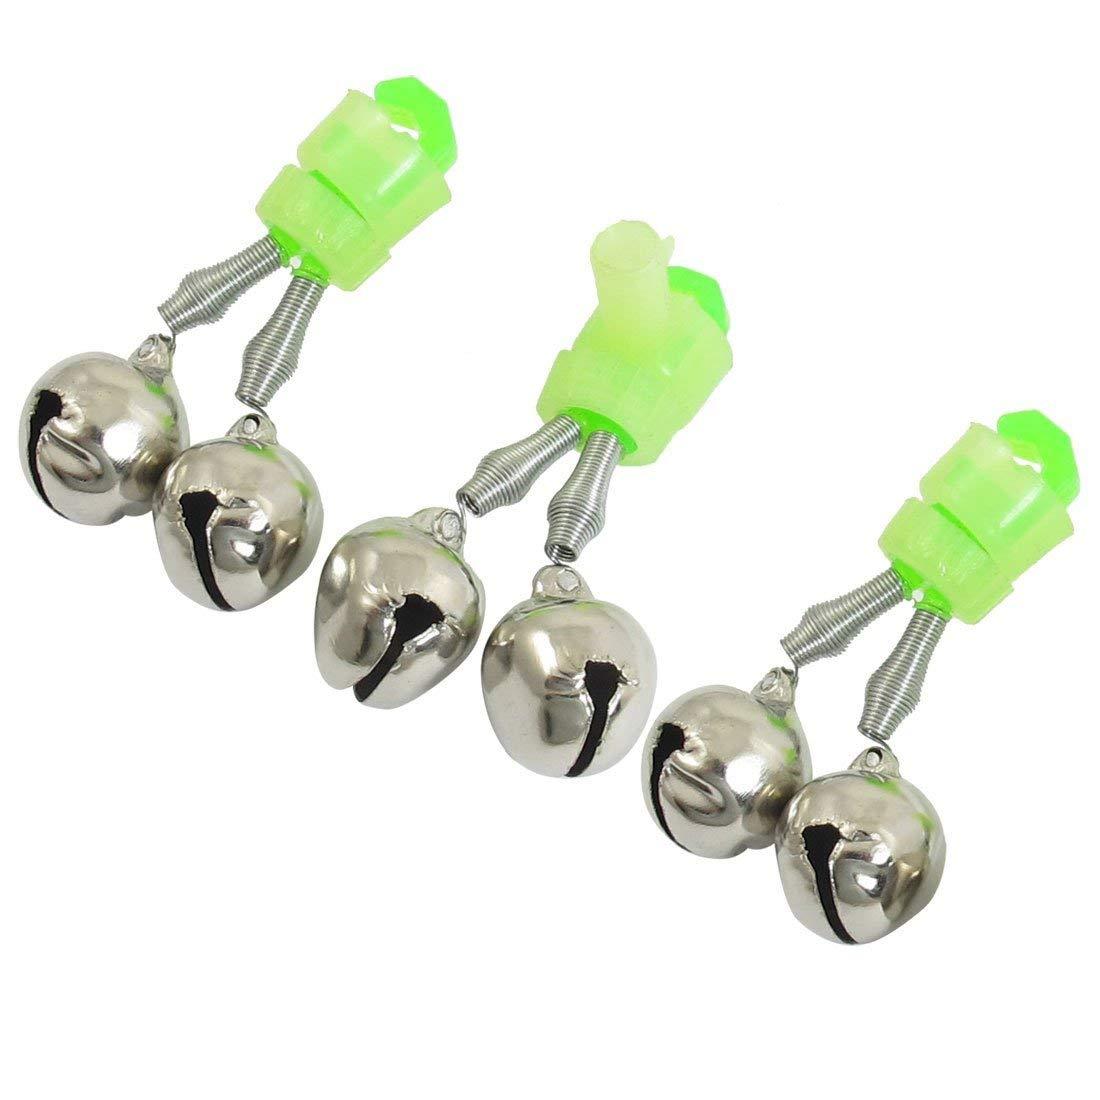 5Pcs Fishing Bite Bait Alarm Twin 2 Bells Rod Tip Clip Clamp On Alert Ring